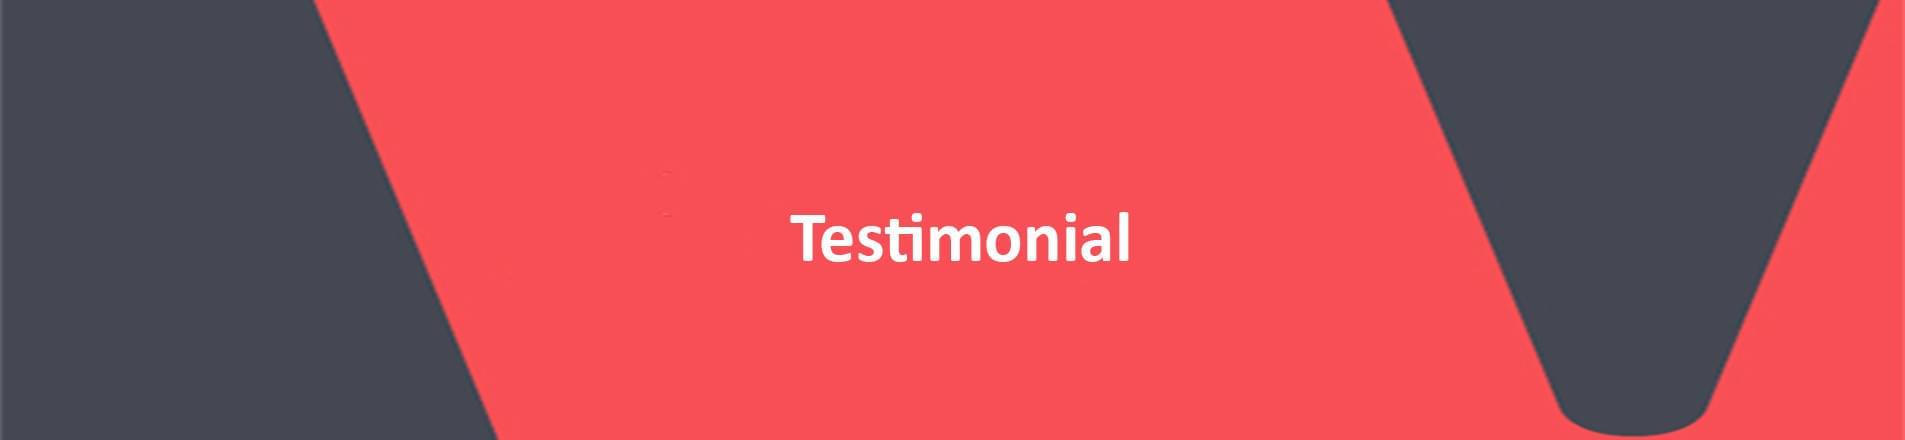 The word Testimonial on red VERCIDA branded background